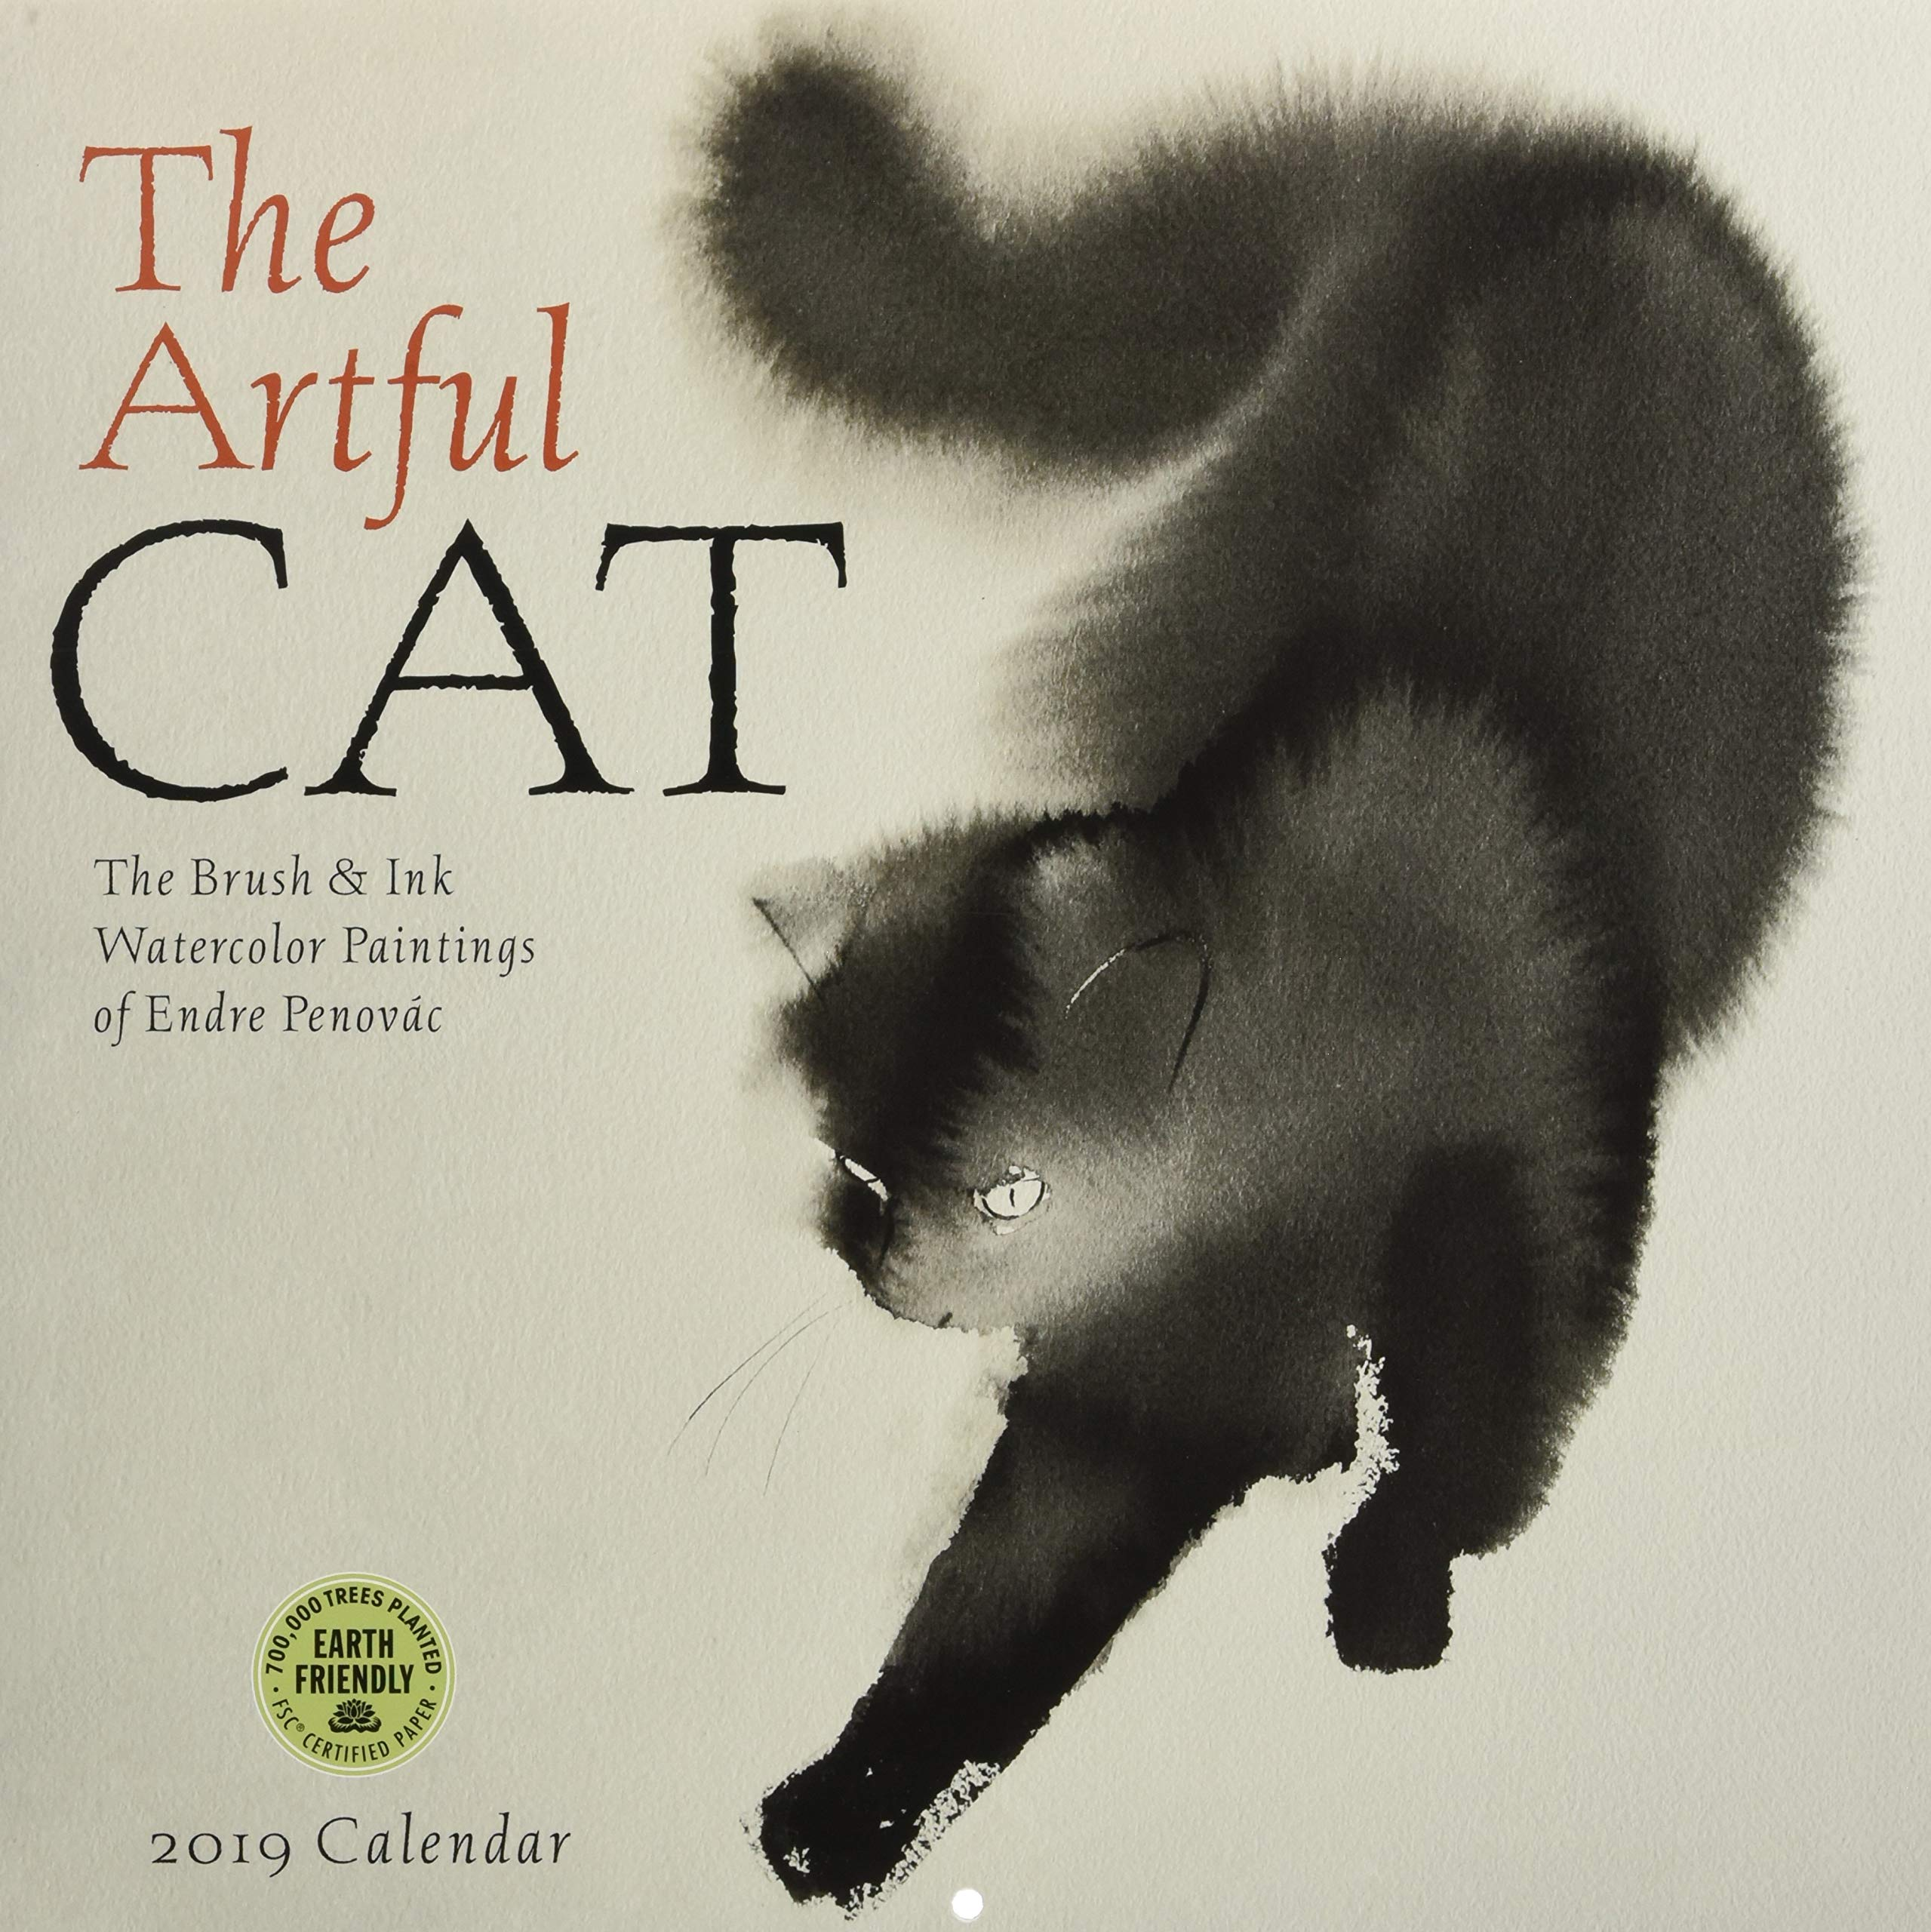 The Artful Cat 2019 Wall Calendar: Brush & Ink Watercolor Paintings by Endre Penovac